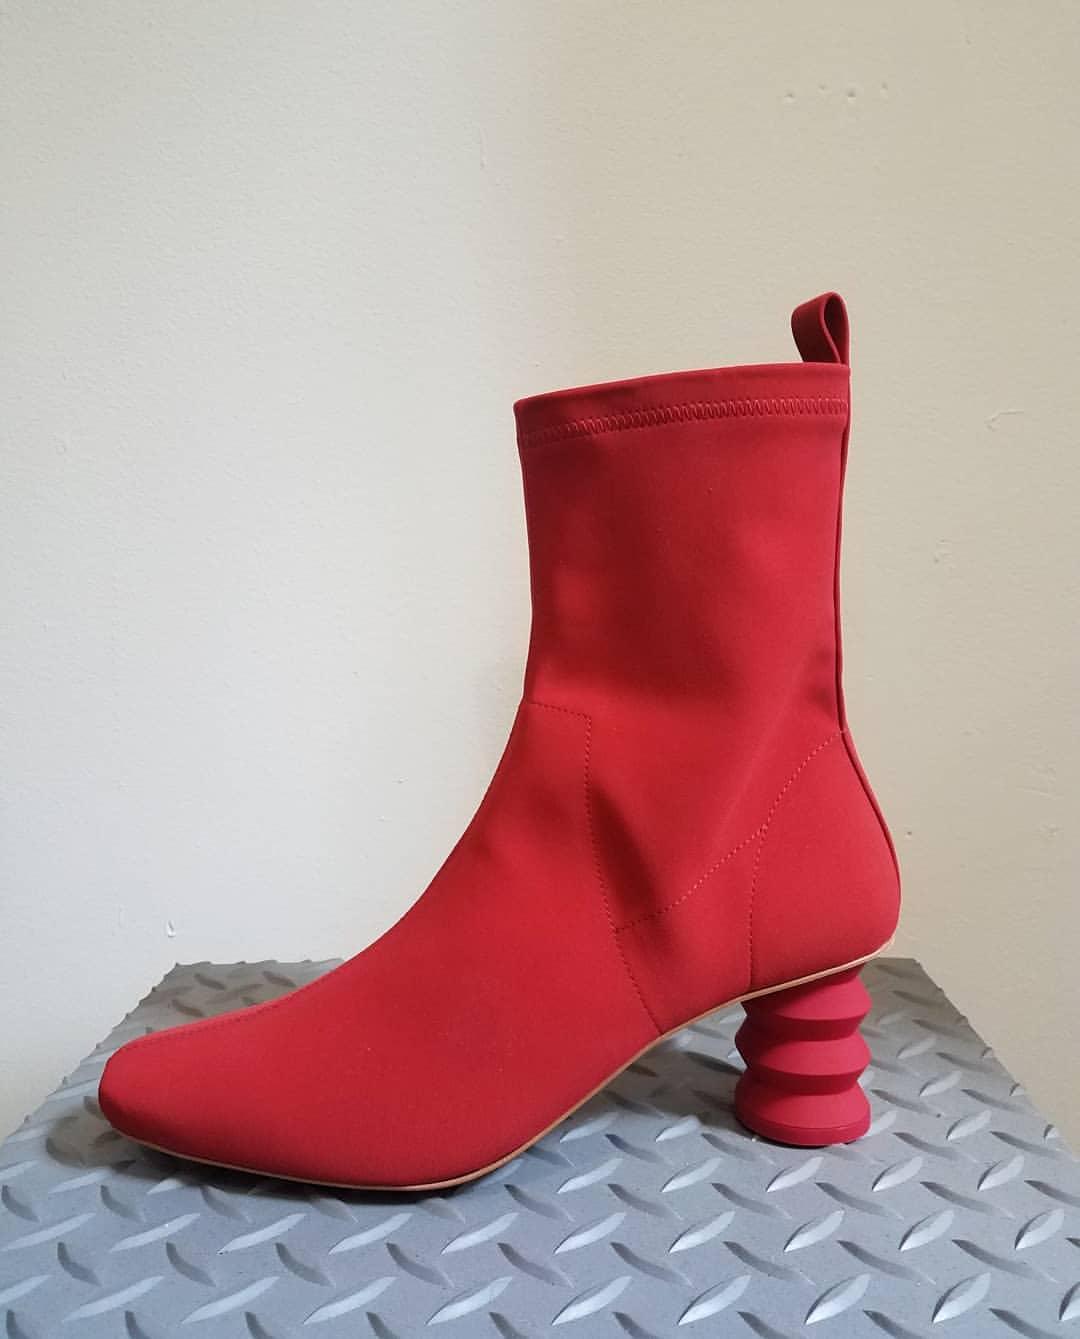 Shoes, $475 at Wheretoget